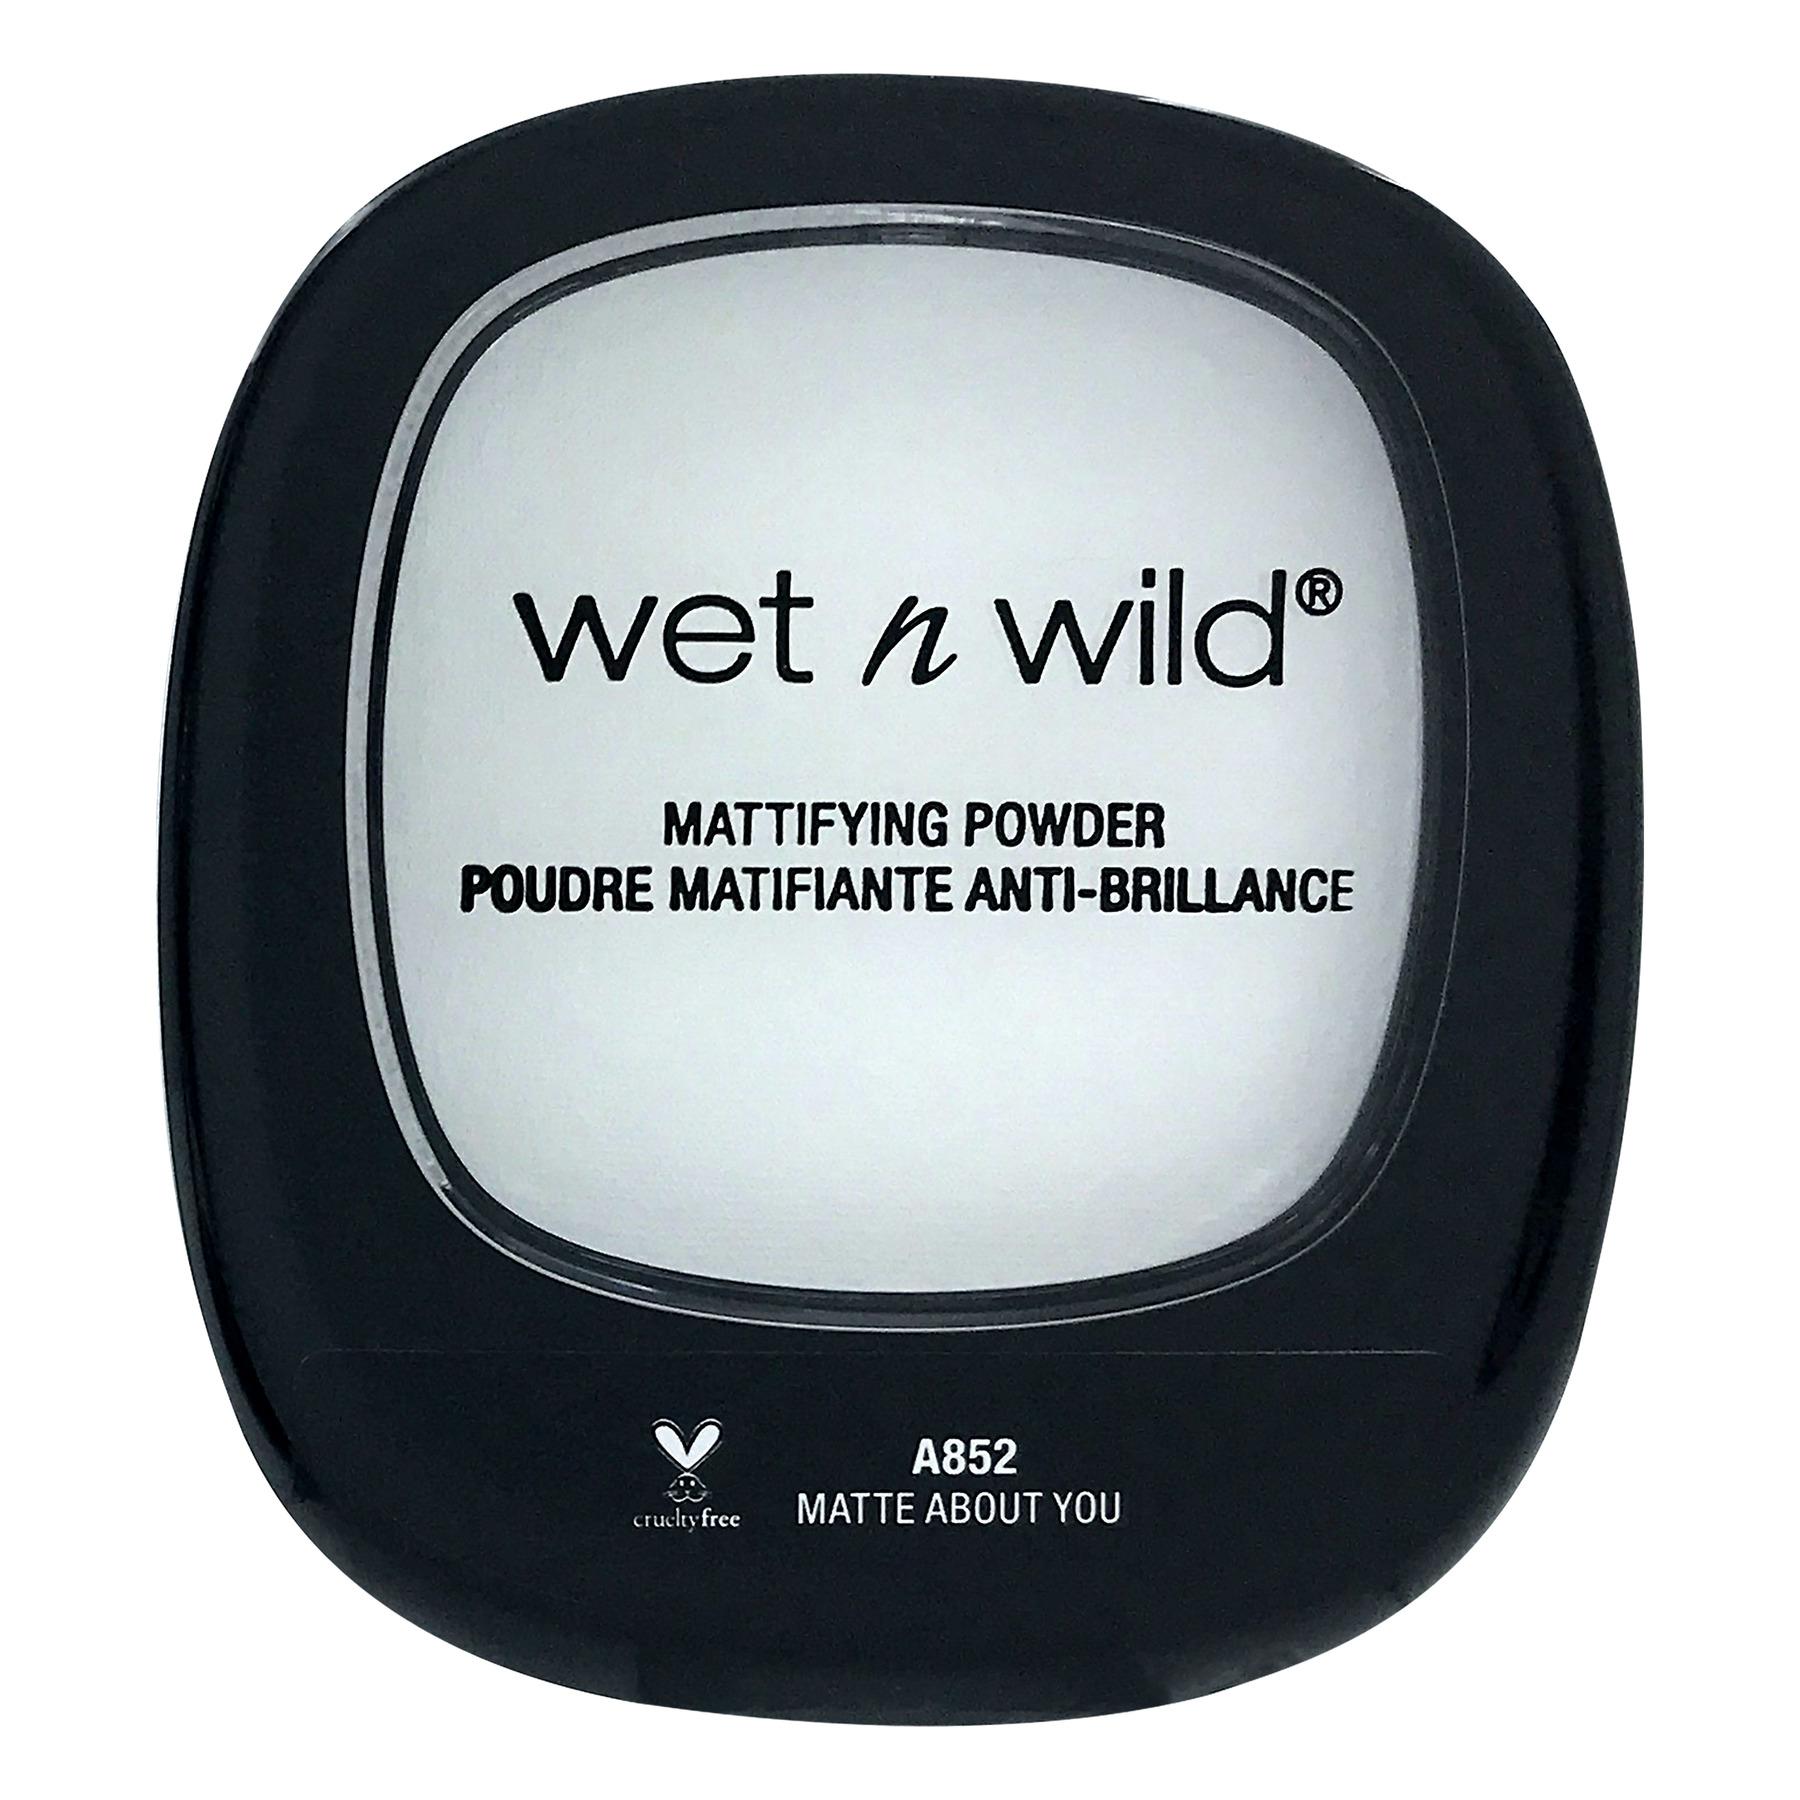 wet n wild Take On the Day Mattifying Powder, Matte About You